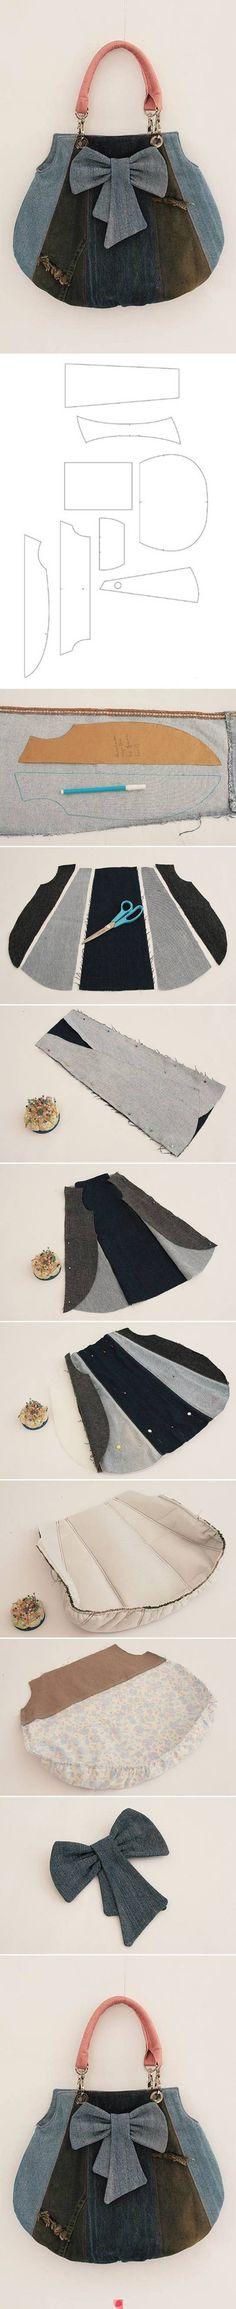 Create a purse from drawn fabric panels! Pretty cool! ~Lee Ann H. Crochetgottalove.blogspot.com